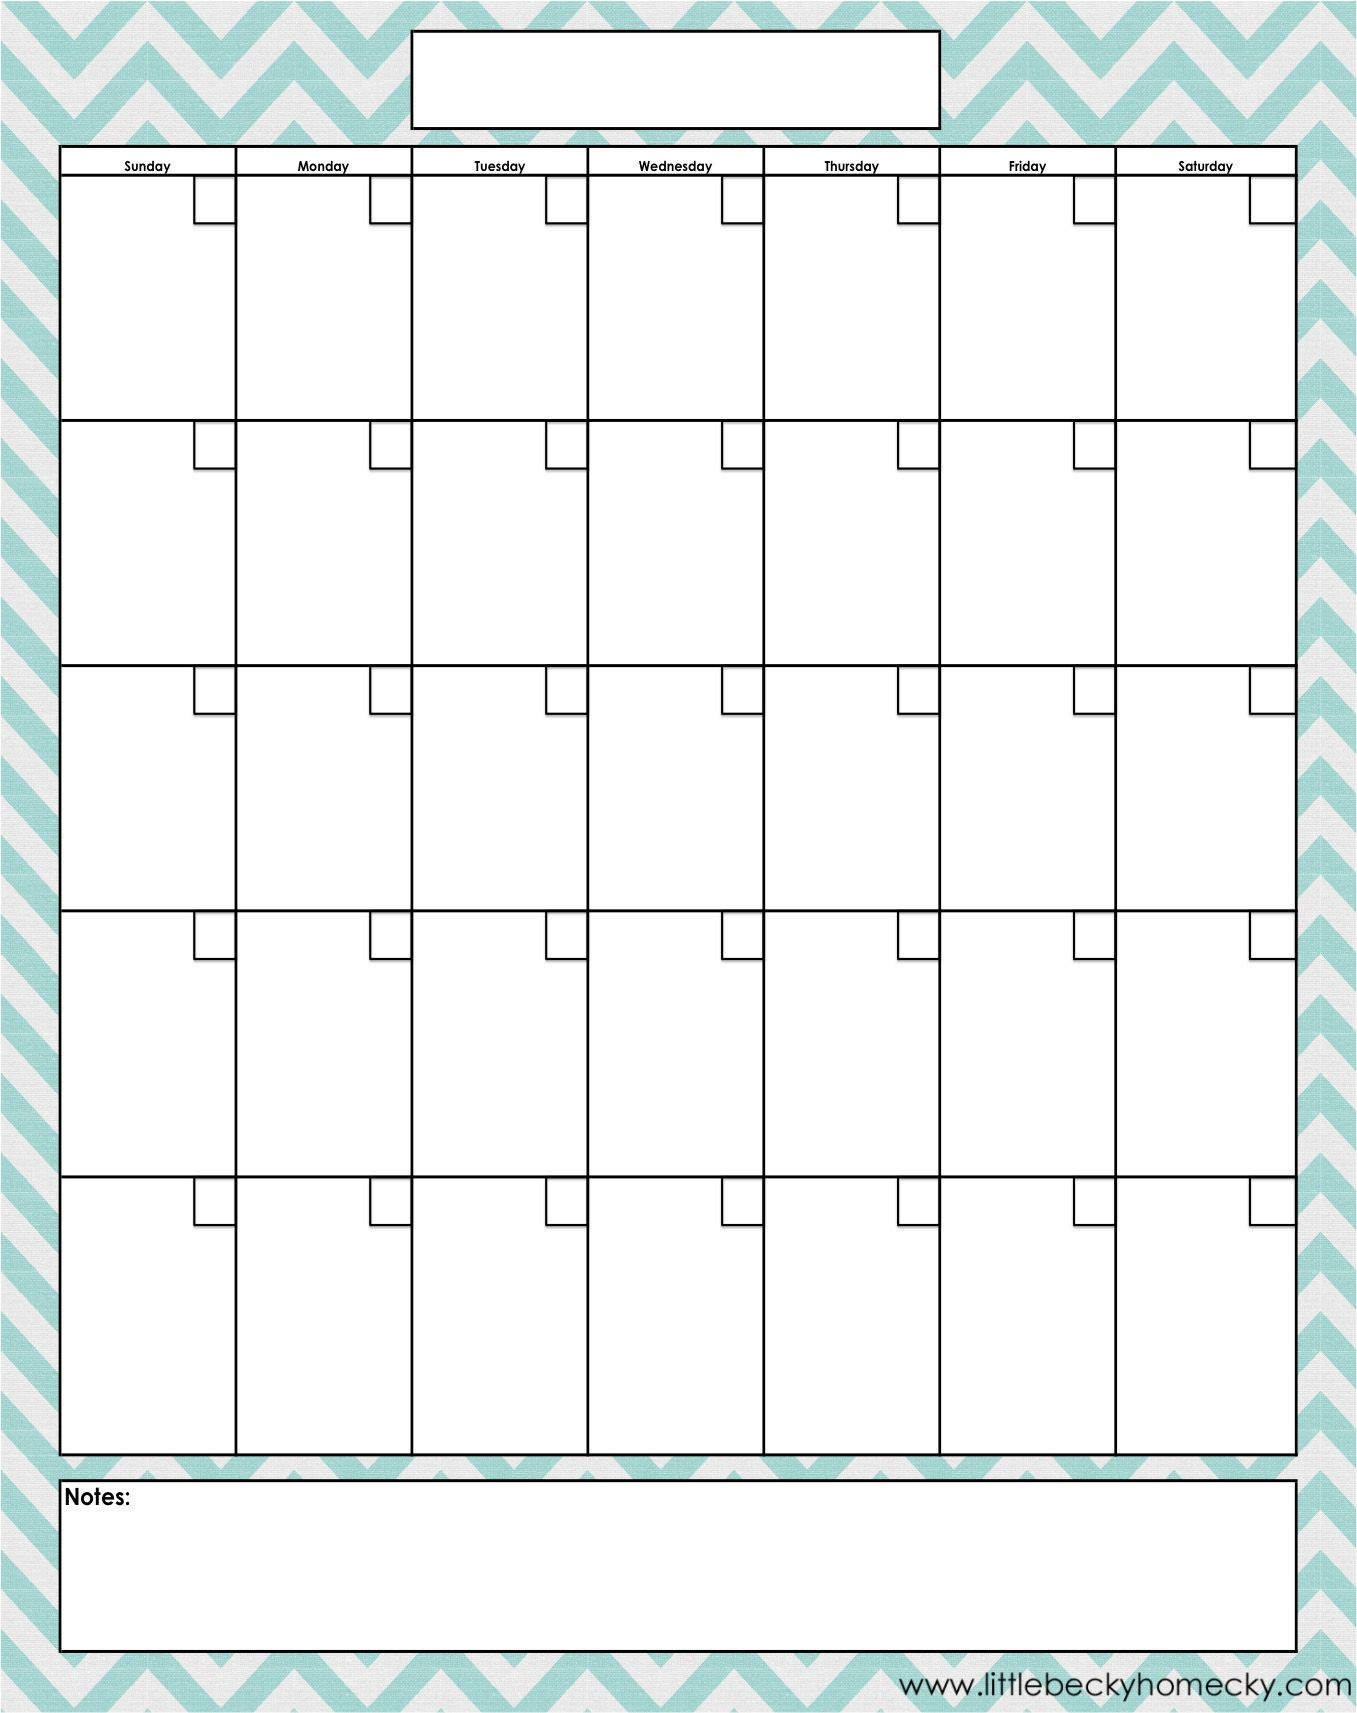 Printable Fill In Calendar | Free Printable Blog Planner within Blank Fill In Calendar